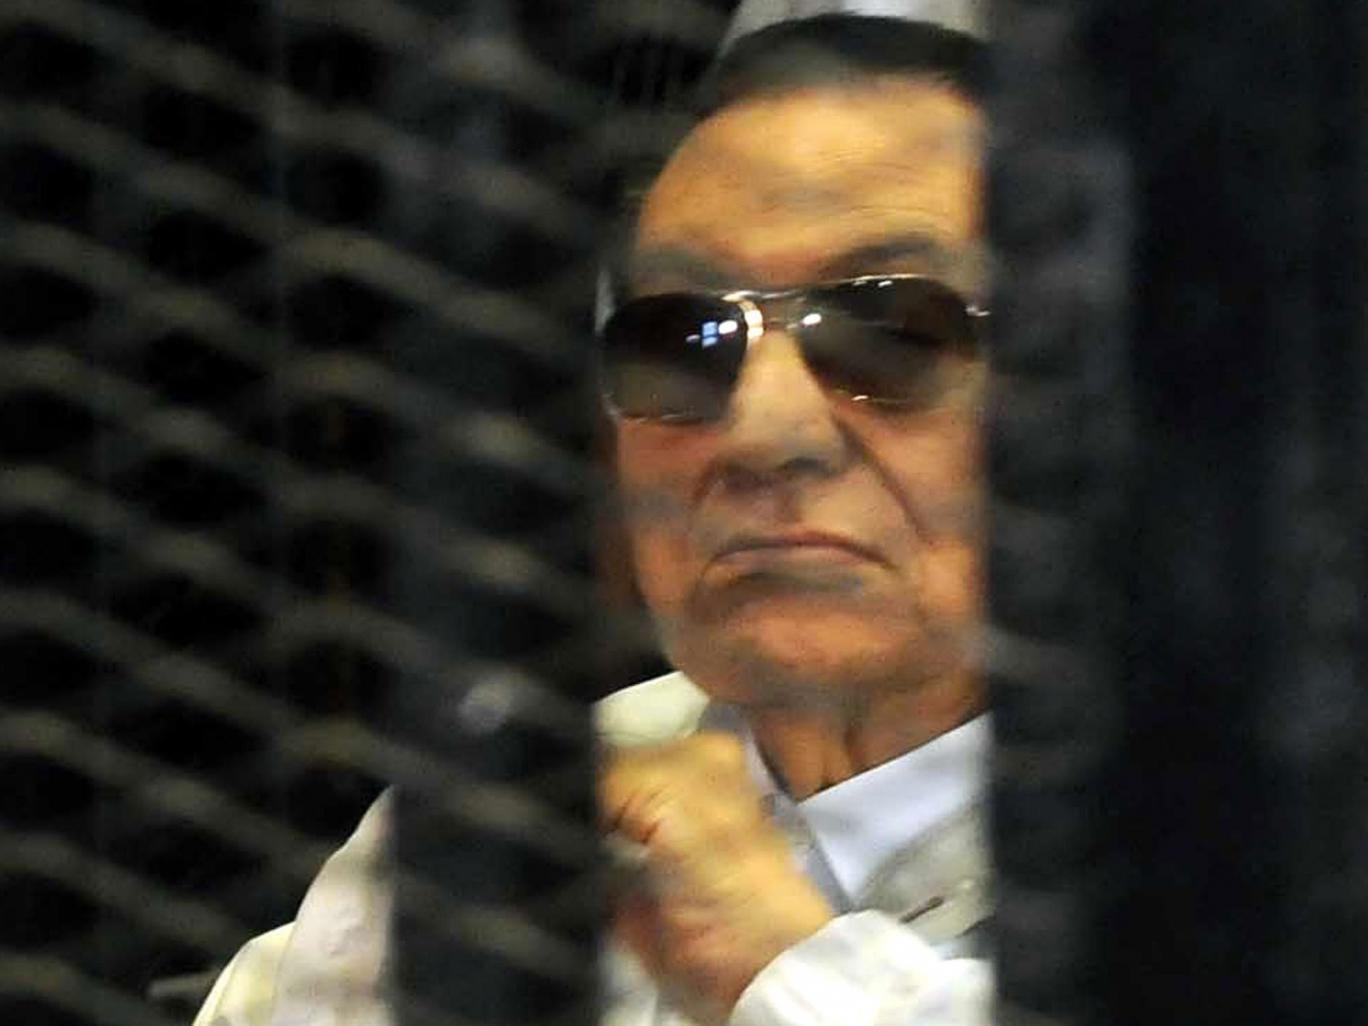 Hosni Mubarak has been sentenced to three years in jail